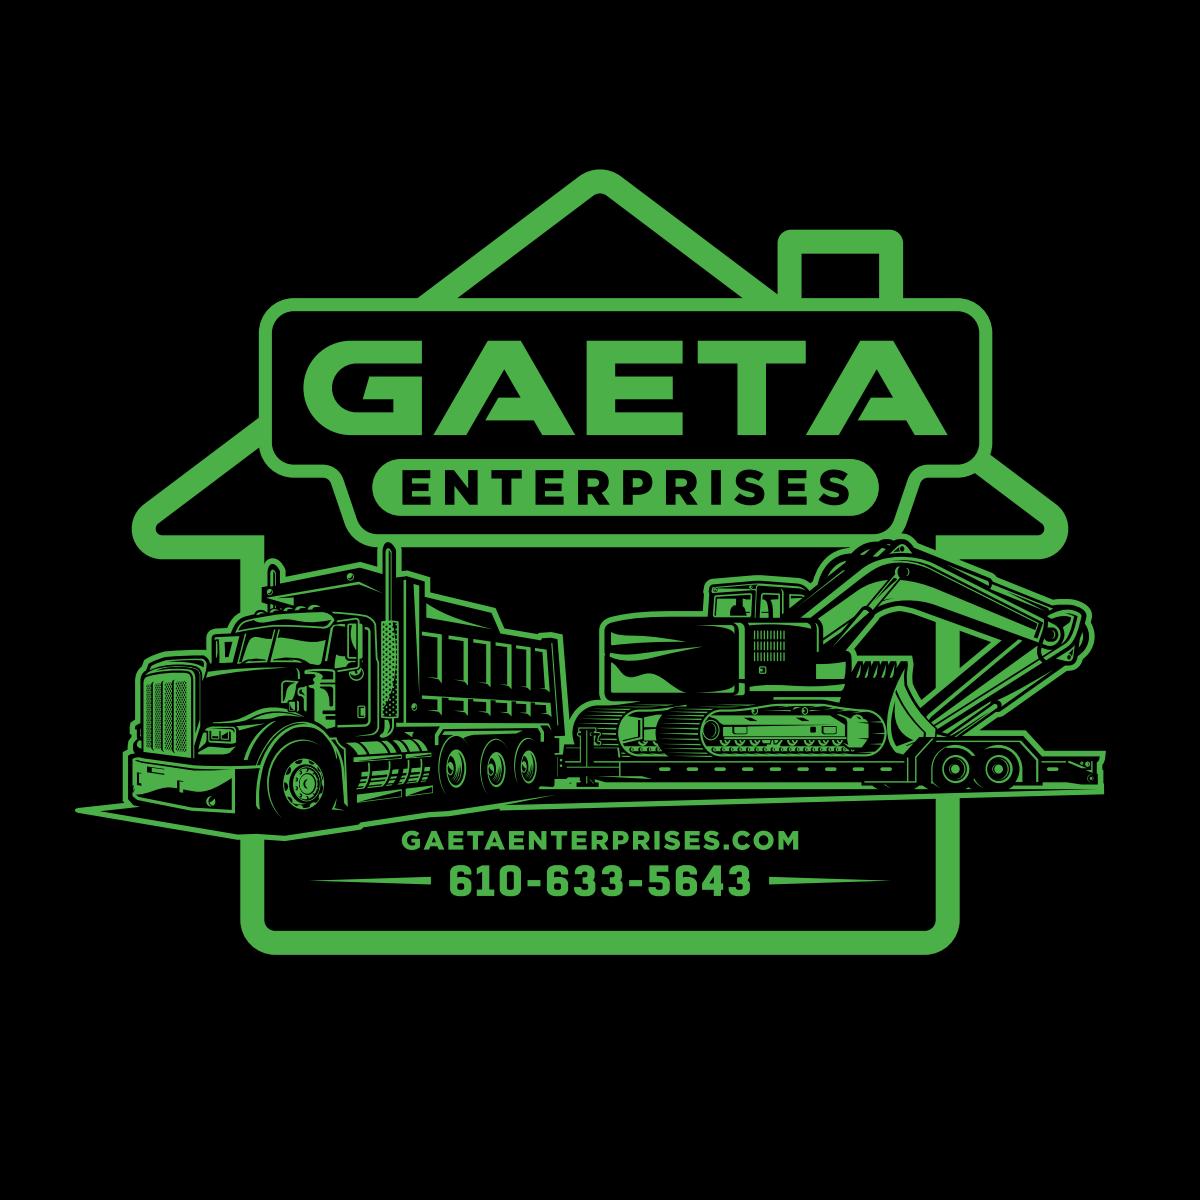 Gaeta Enterprises